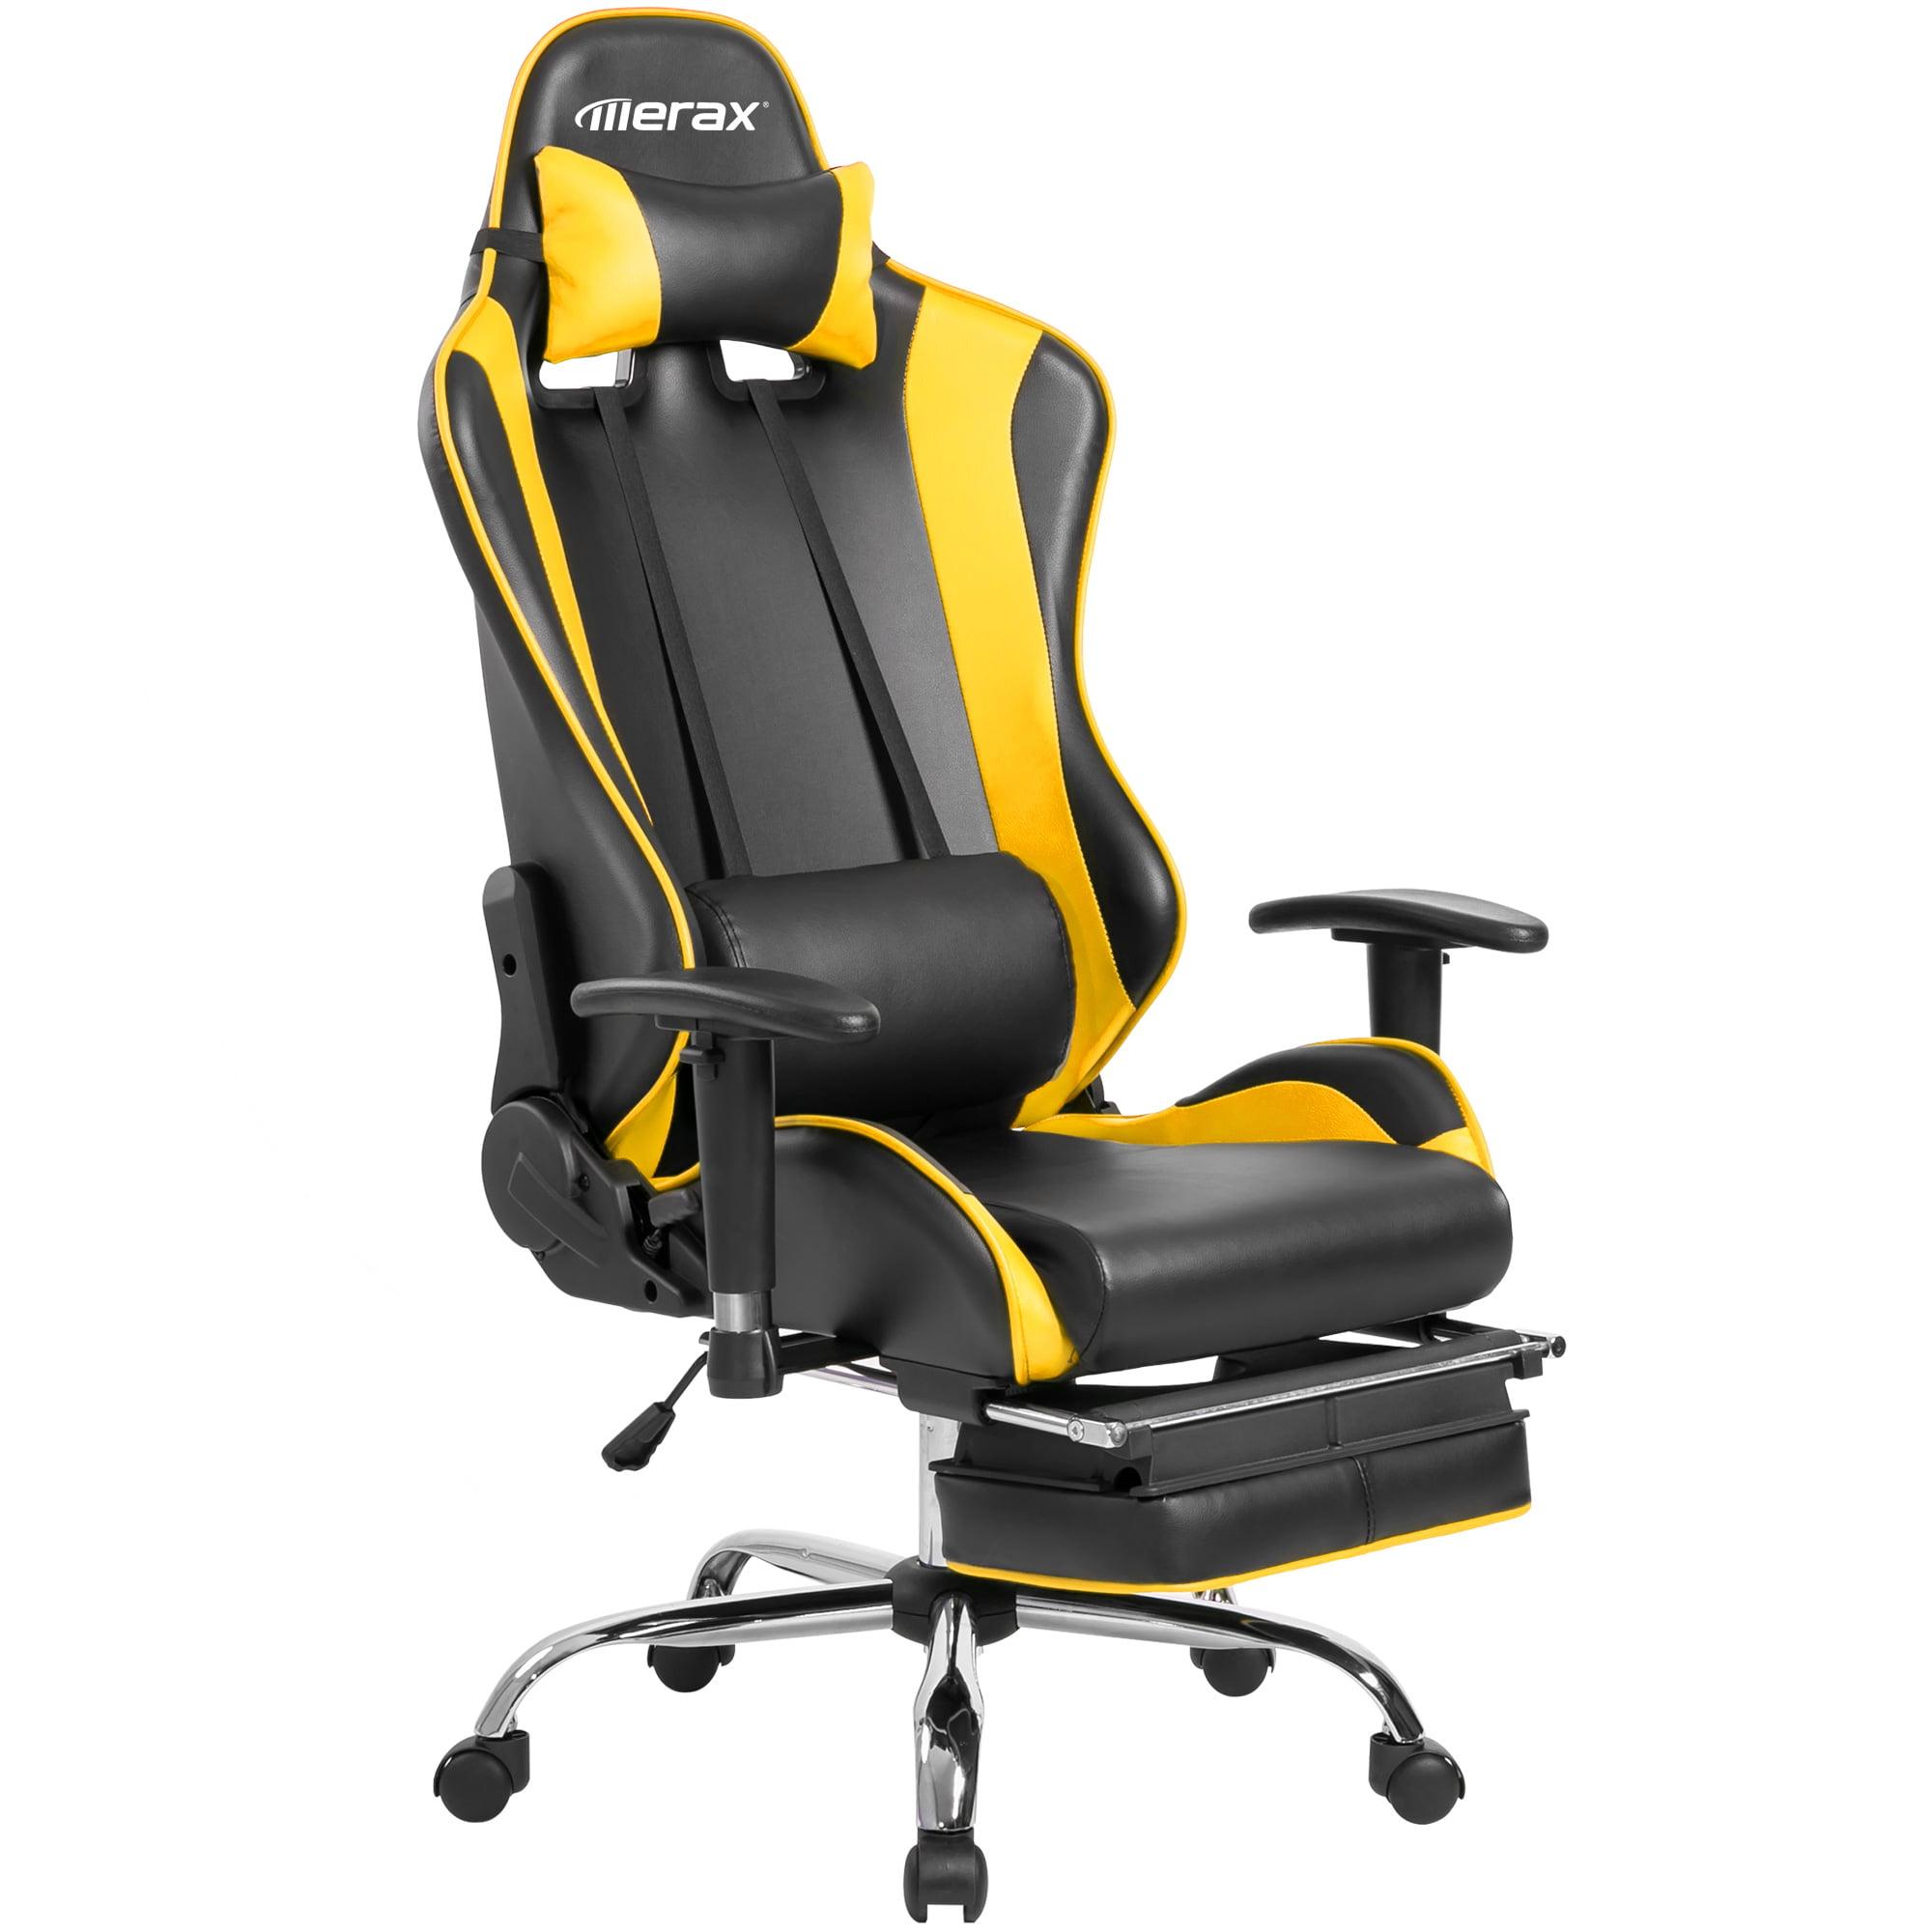 Merax High-Back Ergonomic Racing Gaming Office Chair Recliner